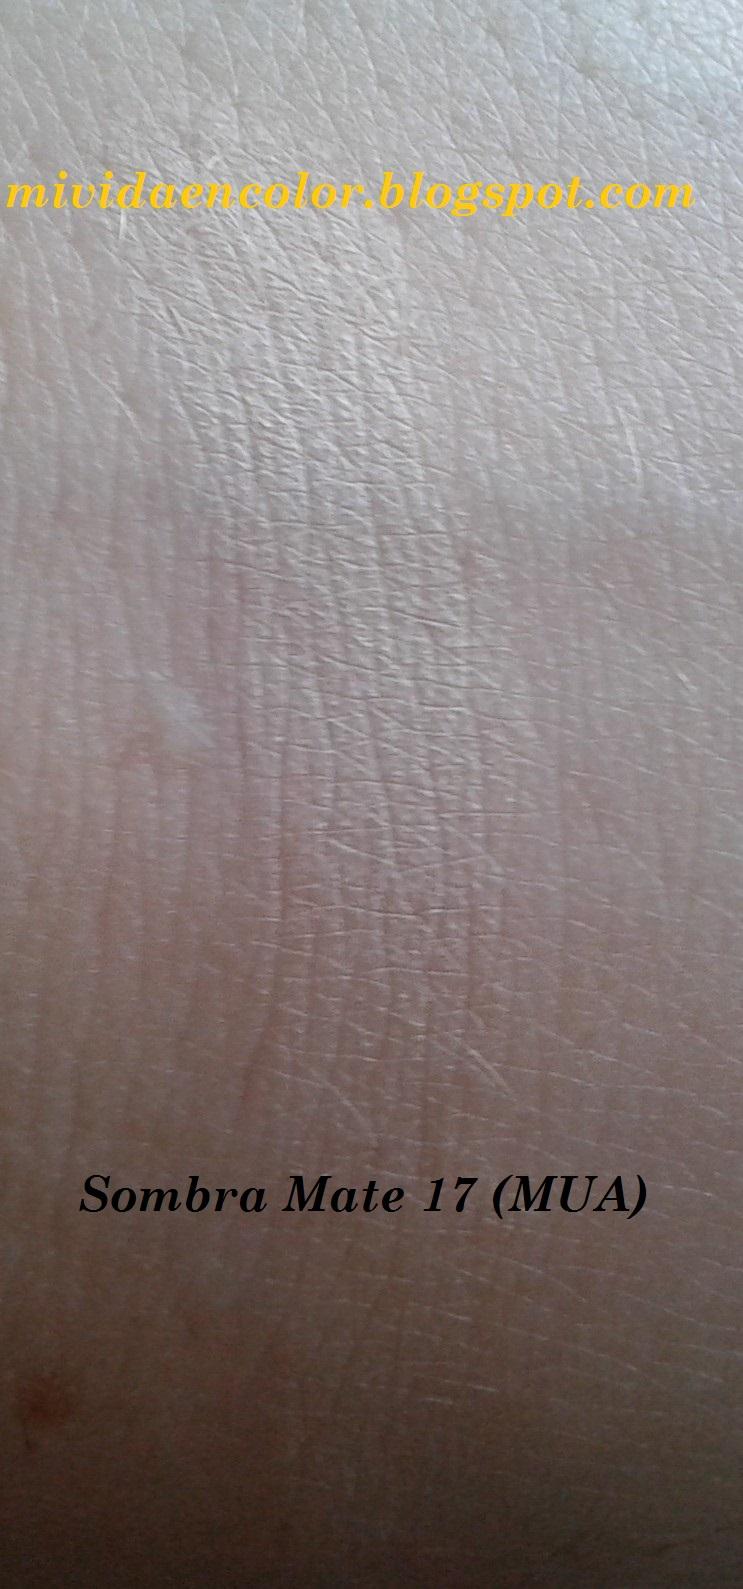 haul-reseña-opinión-swatch-blog-belleza-maquillaje-sombraMate-17-de MUA- clon sombra Foxy-de-la-Naked-2-de-Urban-Decay-U.D-